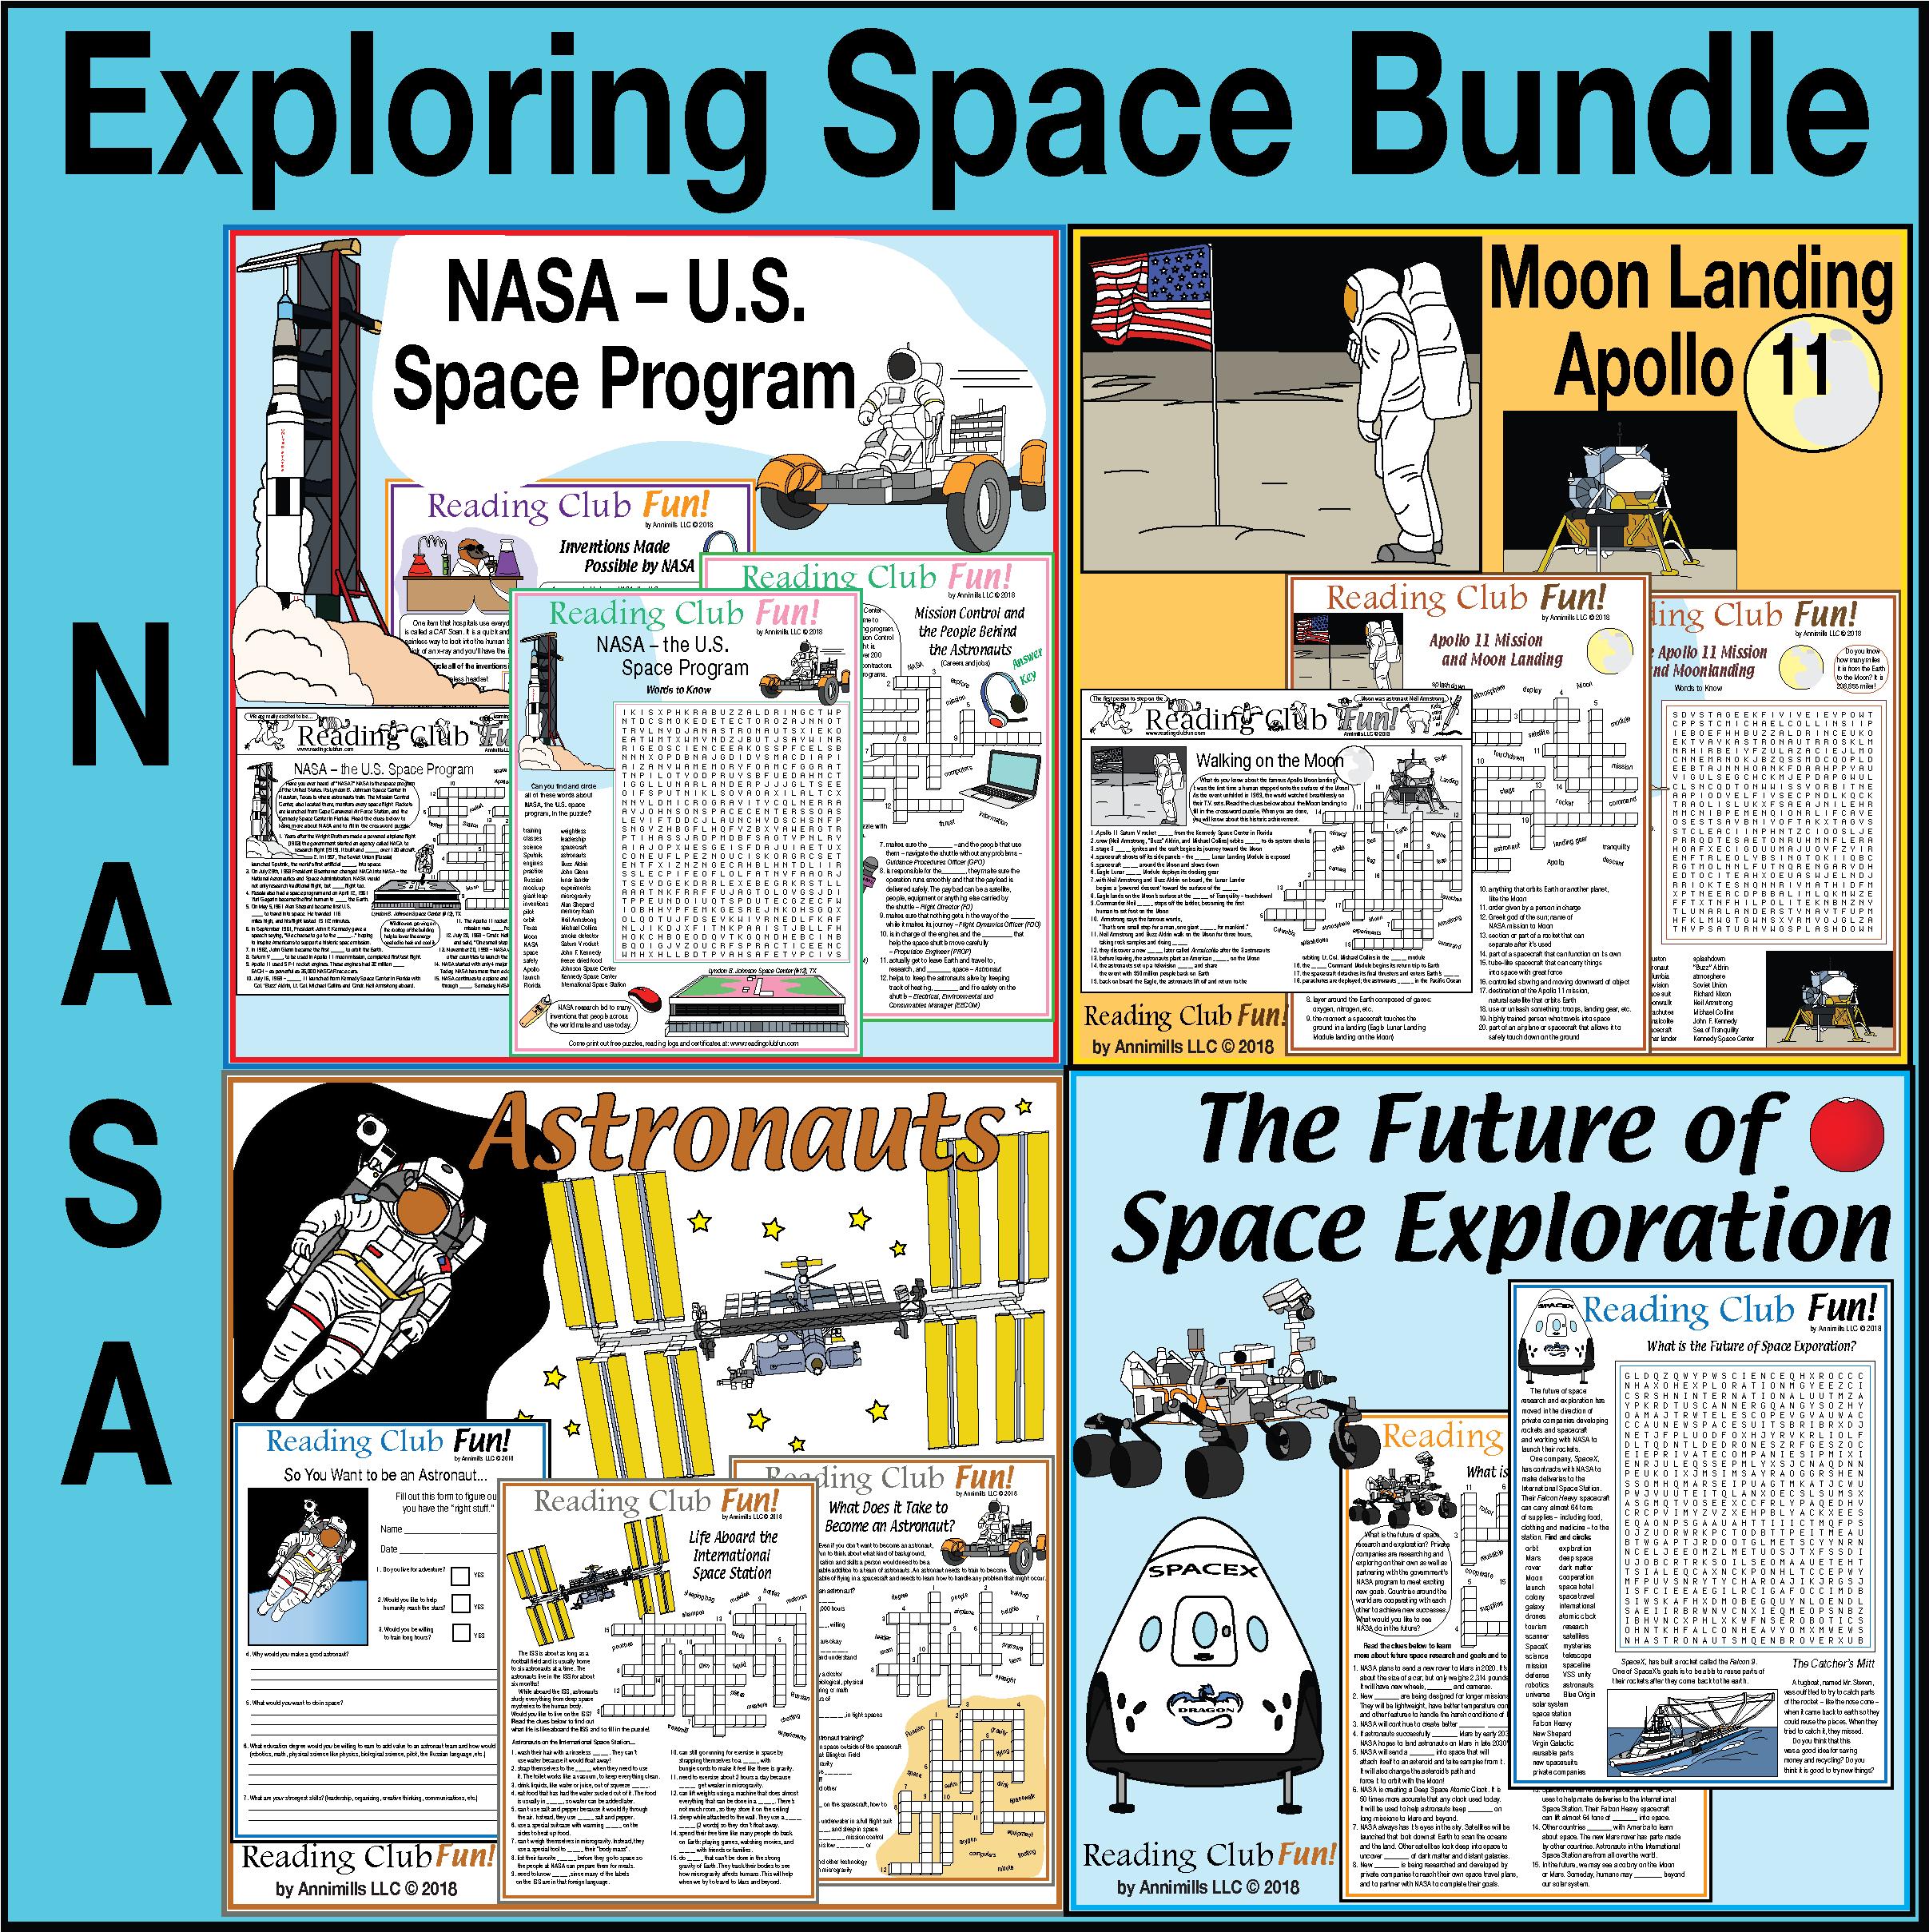 Exploring Space Nasa Moon Landing Astronauts And Future